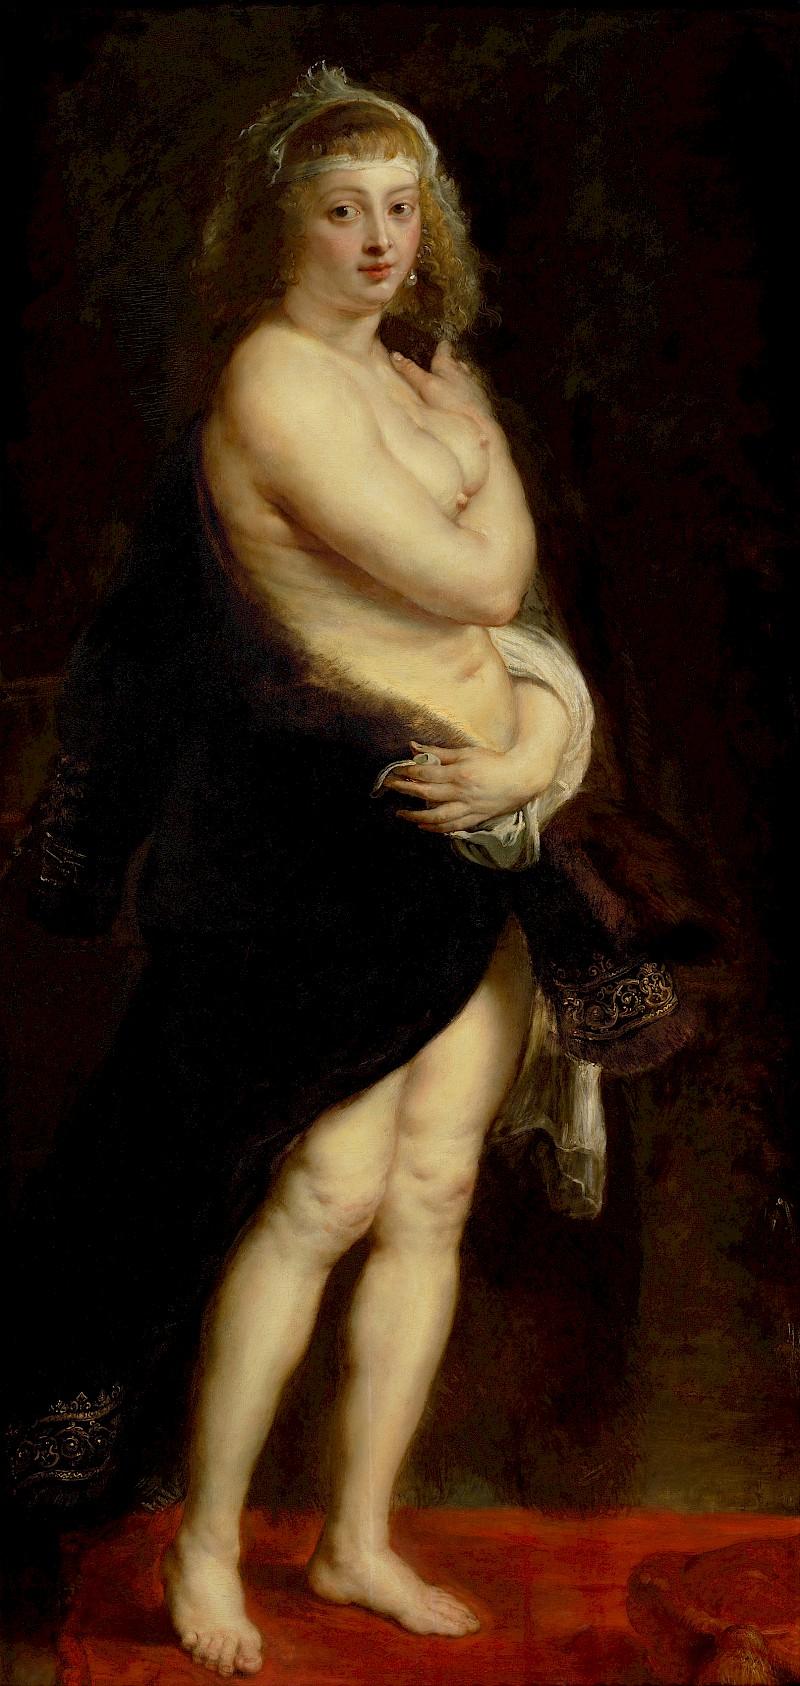 Элен Фурман в меховой мантии, Рубенс, 1636 до 1638.jpg